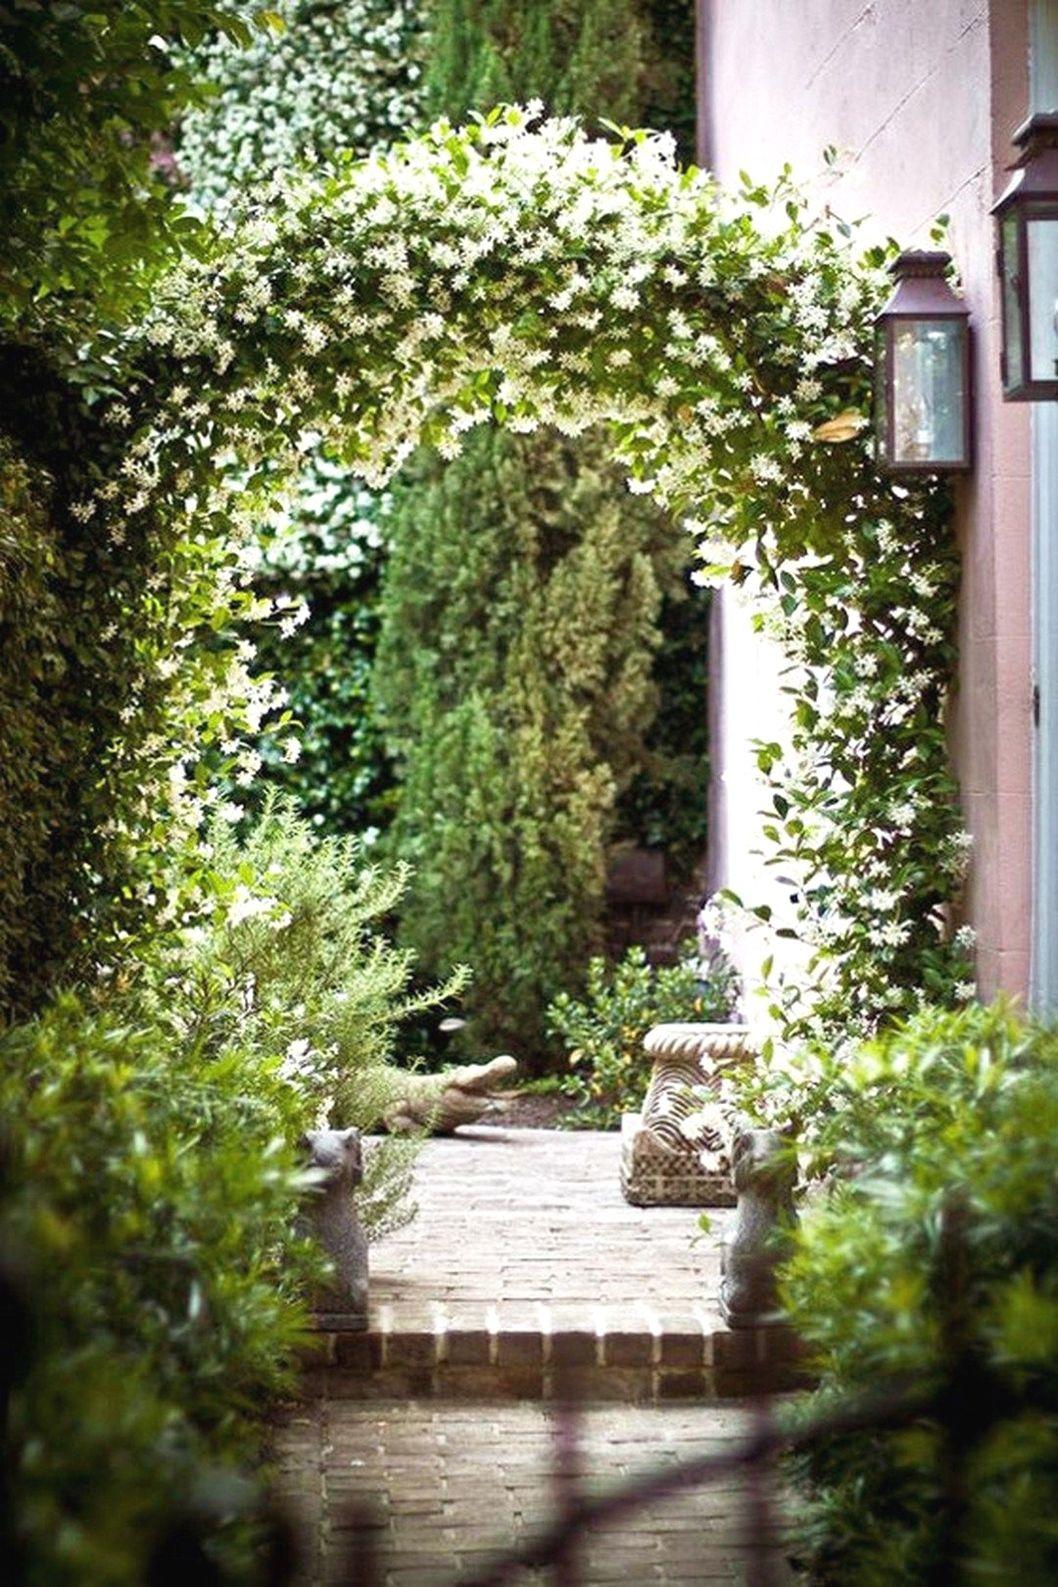 landscaping ideas kerala  Garden arches, Beautiful gardens